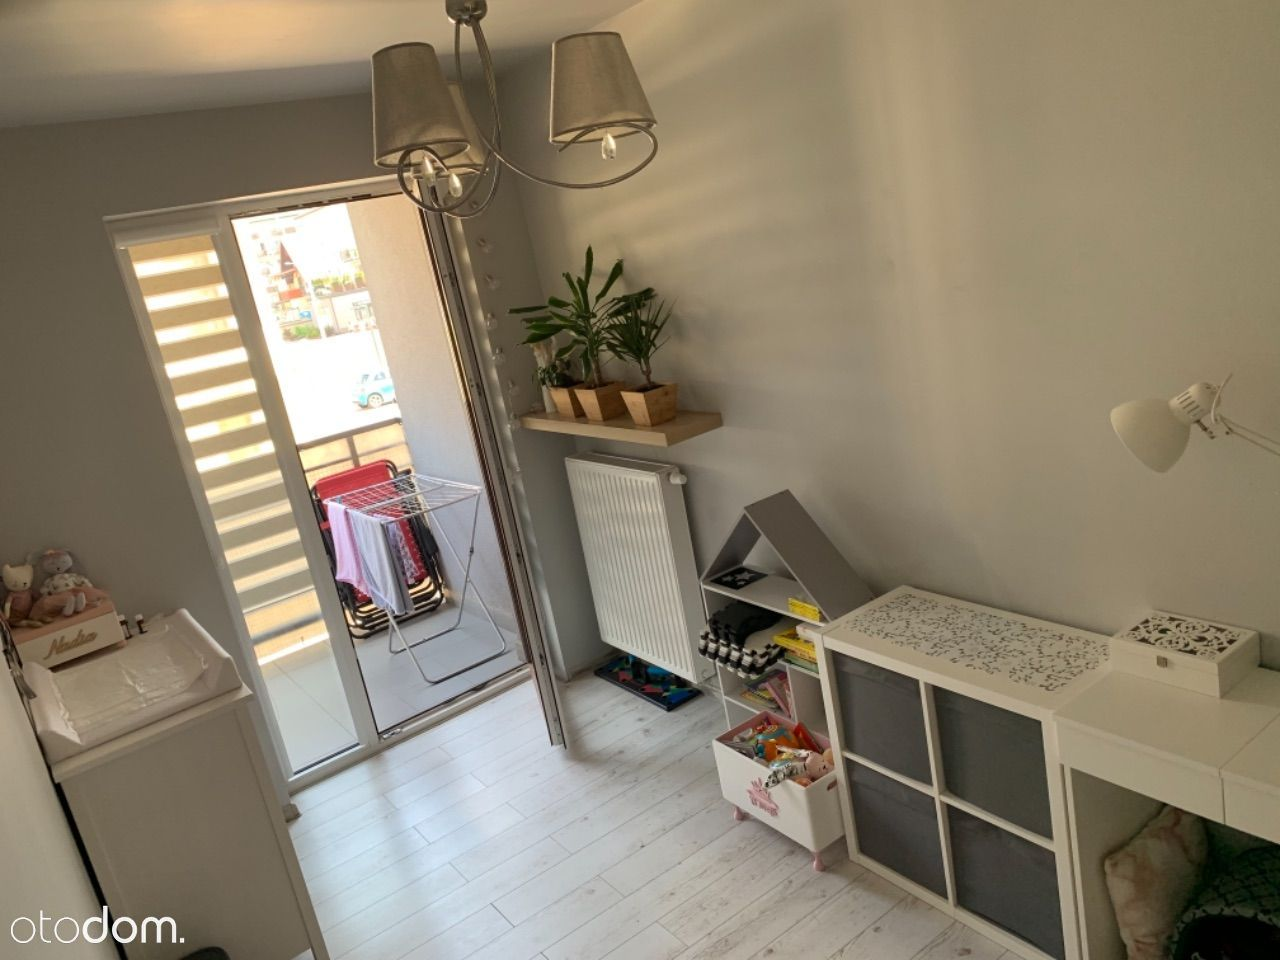 Mieszkanie Ząbki 2 pokoje garaż meble balkon RTV